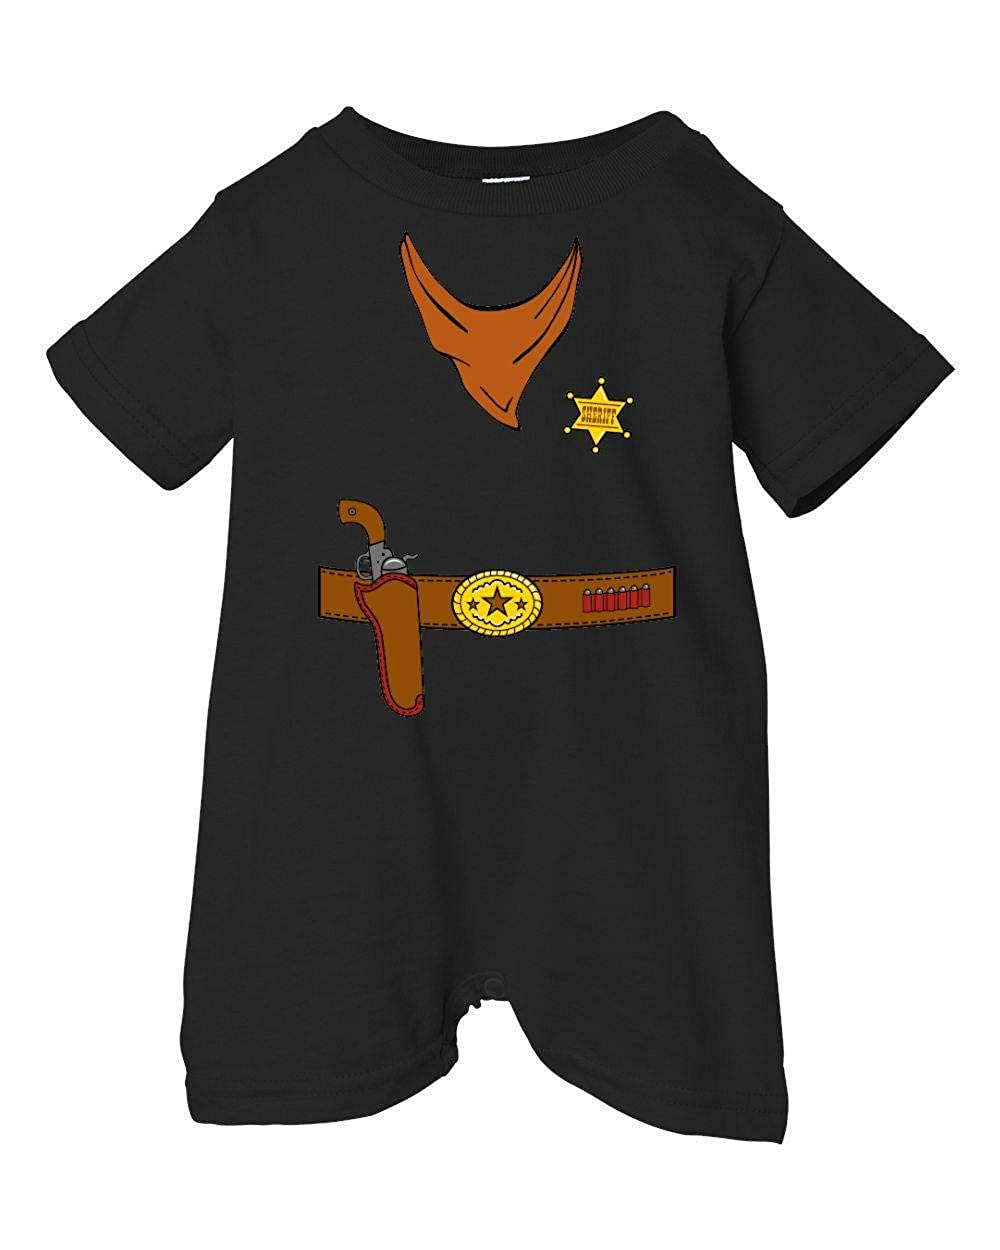 Festive Threads Unisex Baby Sheriffs Holster T-Shirt Romper Black, 12 Months